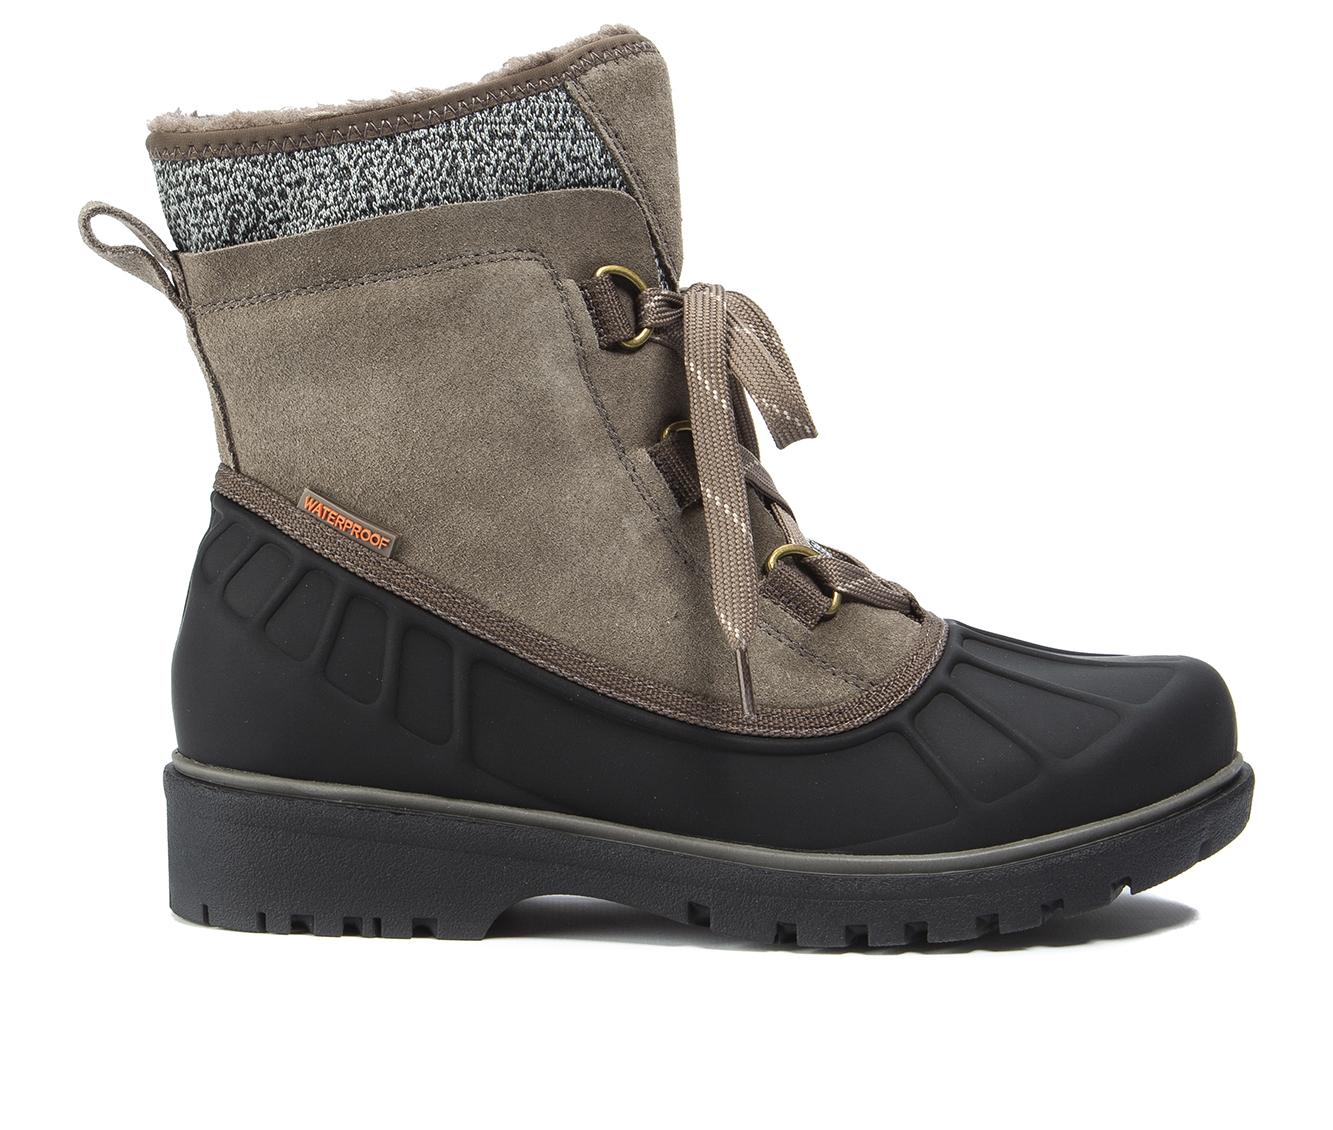 Baretraps Springer Women's Boot (Brown Leather)